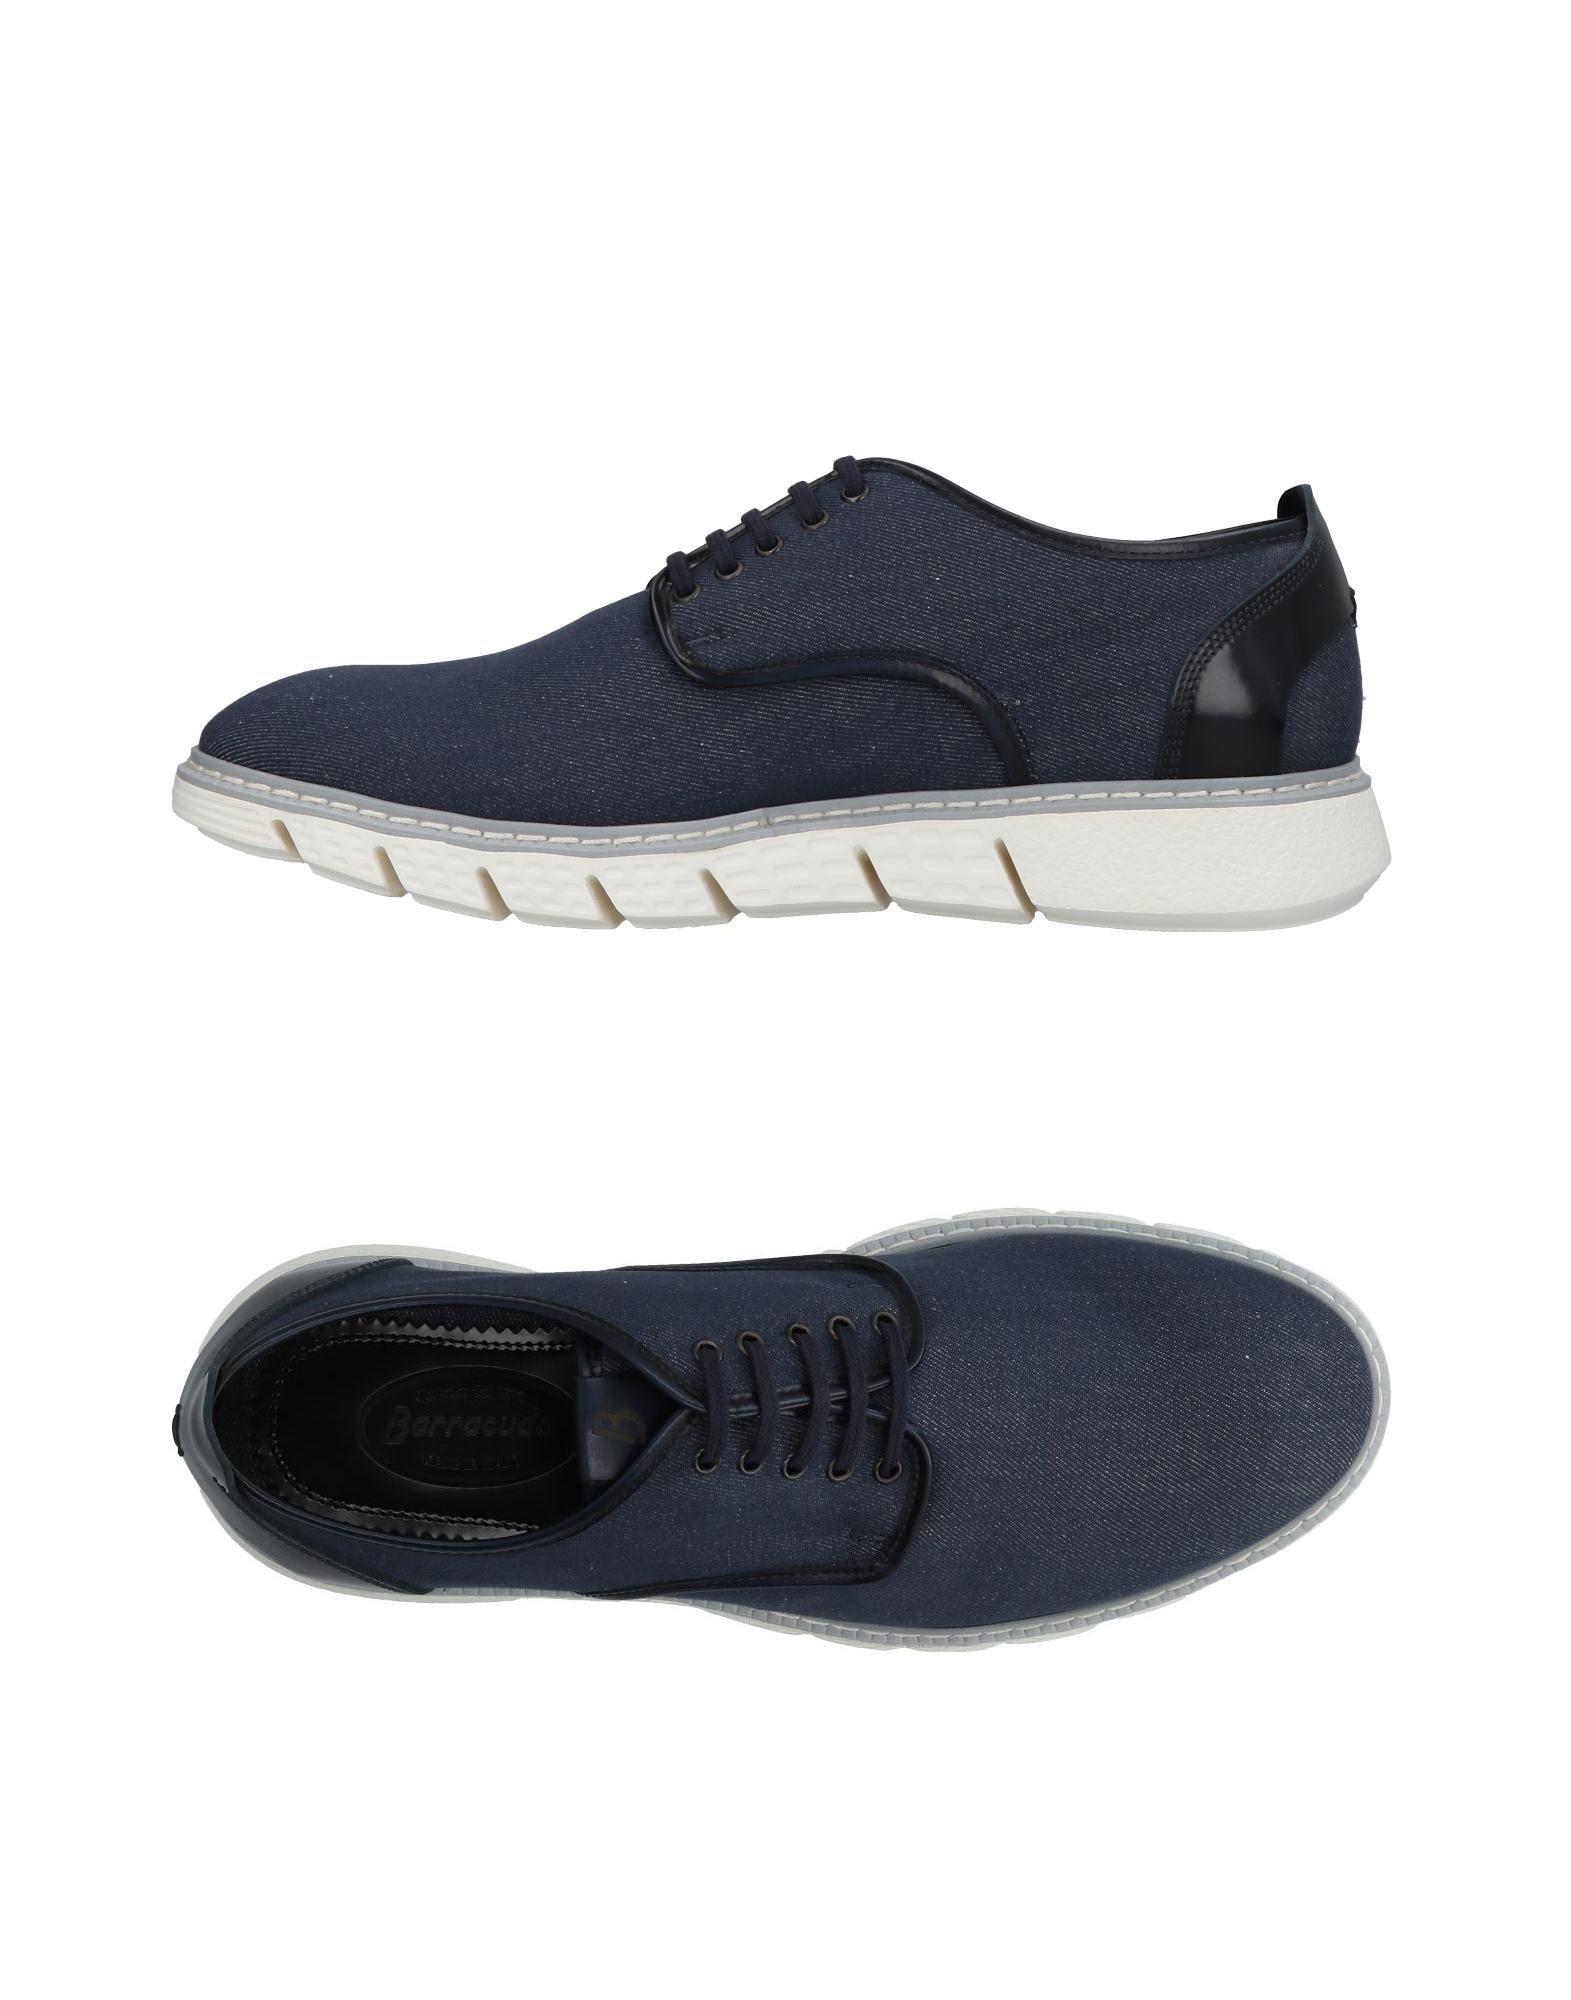 Günstige und modische Schuhe Barracuda Sneakers Herren  11186167JE